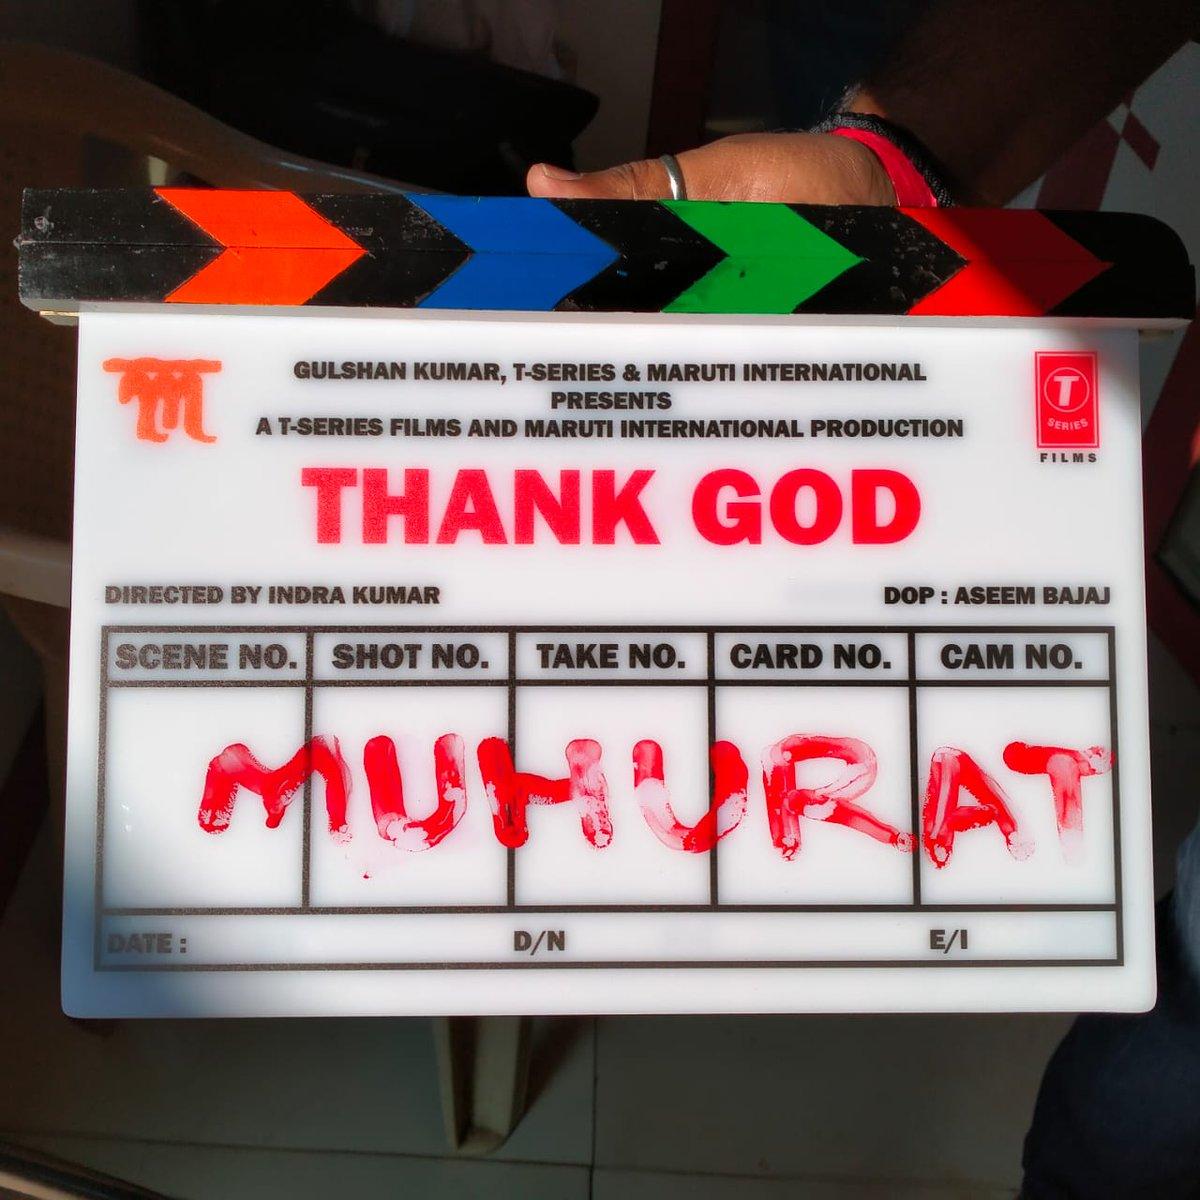 Our Sid next 🎥 The shoot for #ThankGod begins today in Mumbai!   @SidMalhotra 💫  @Rakulpreet @Indra_kumar_9 #BhushanKumar #KrishanKumar #AshokThakeria @SunirKheterpal @DeepakMukut @MunnangiBalu @anandpandit63 #MarkandAdhikari #YashShah @TSeries